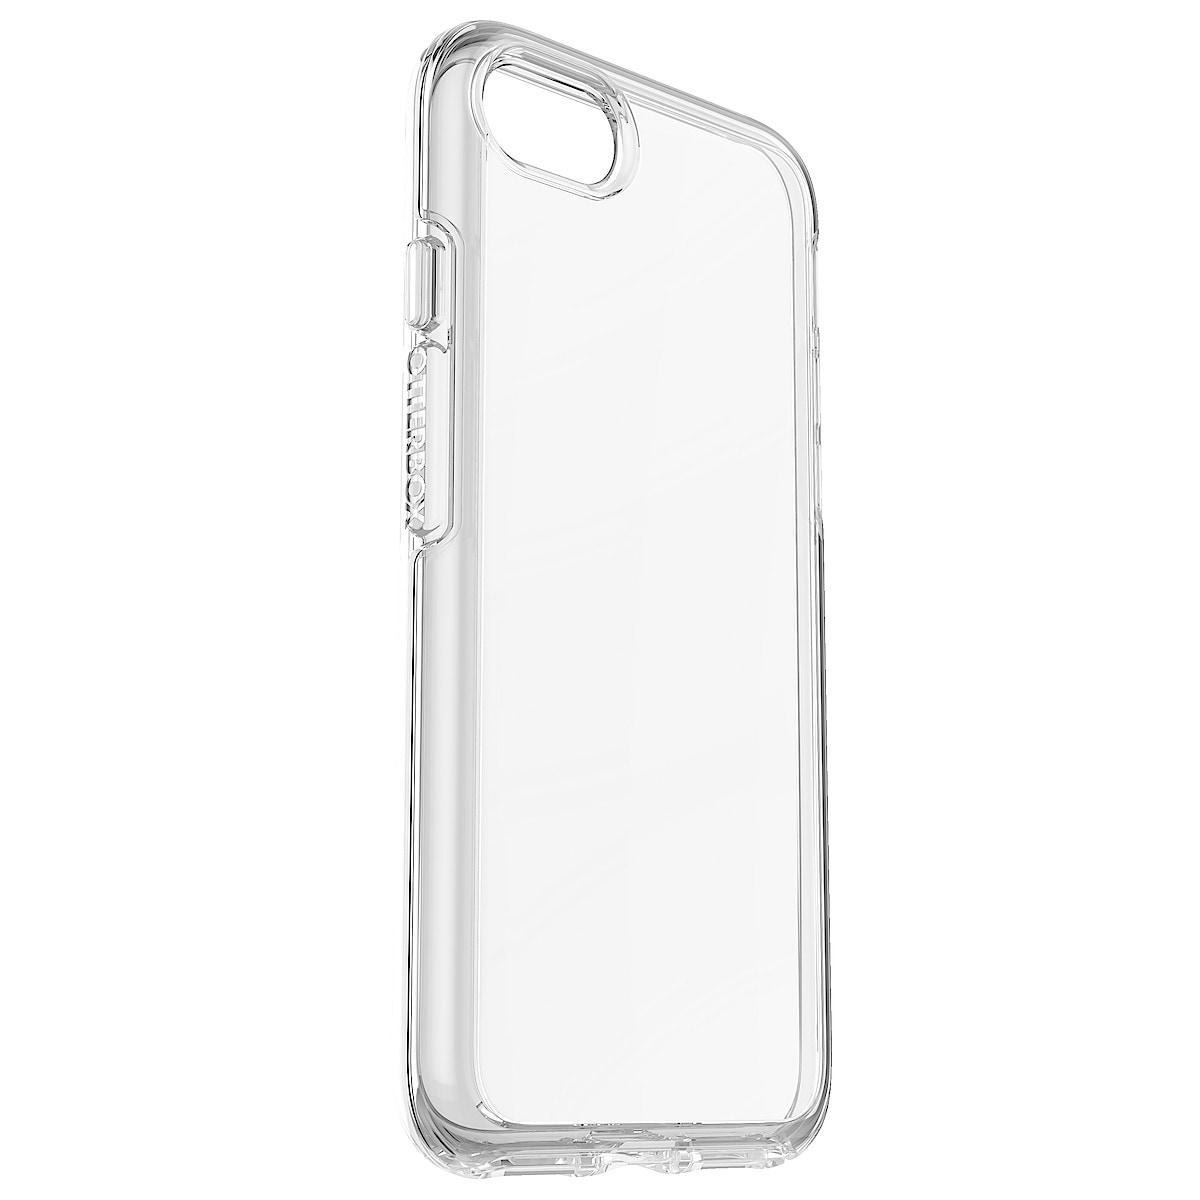 Skyddsskal för iPhone 7 Otterbox Symmetry Clear